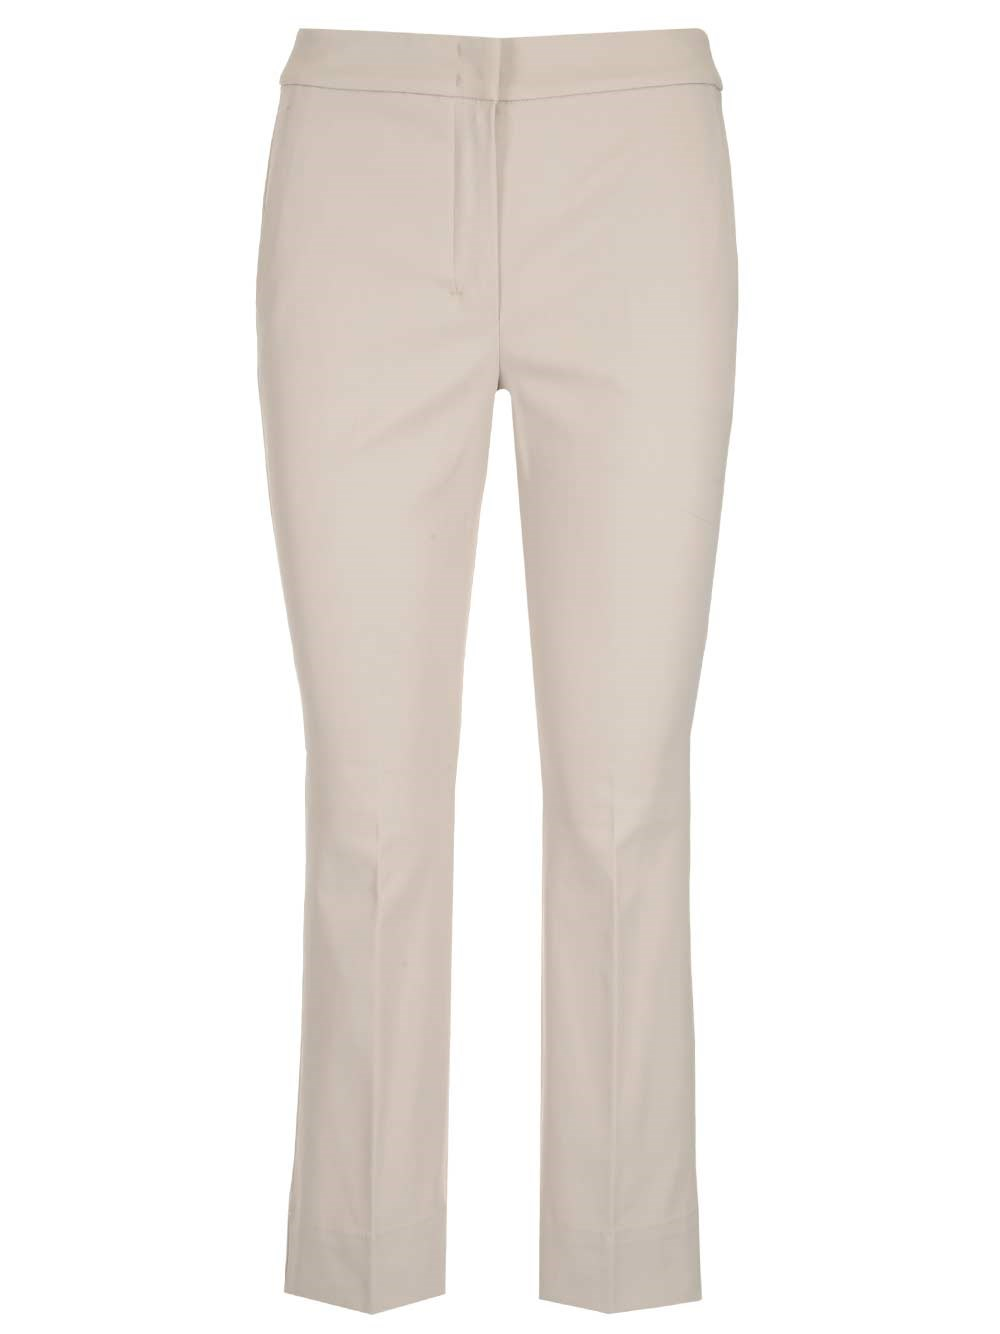 'S MAX MARA Stretch Cotton Trousers